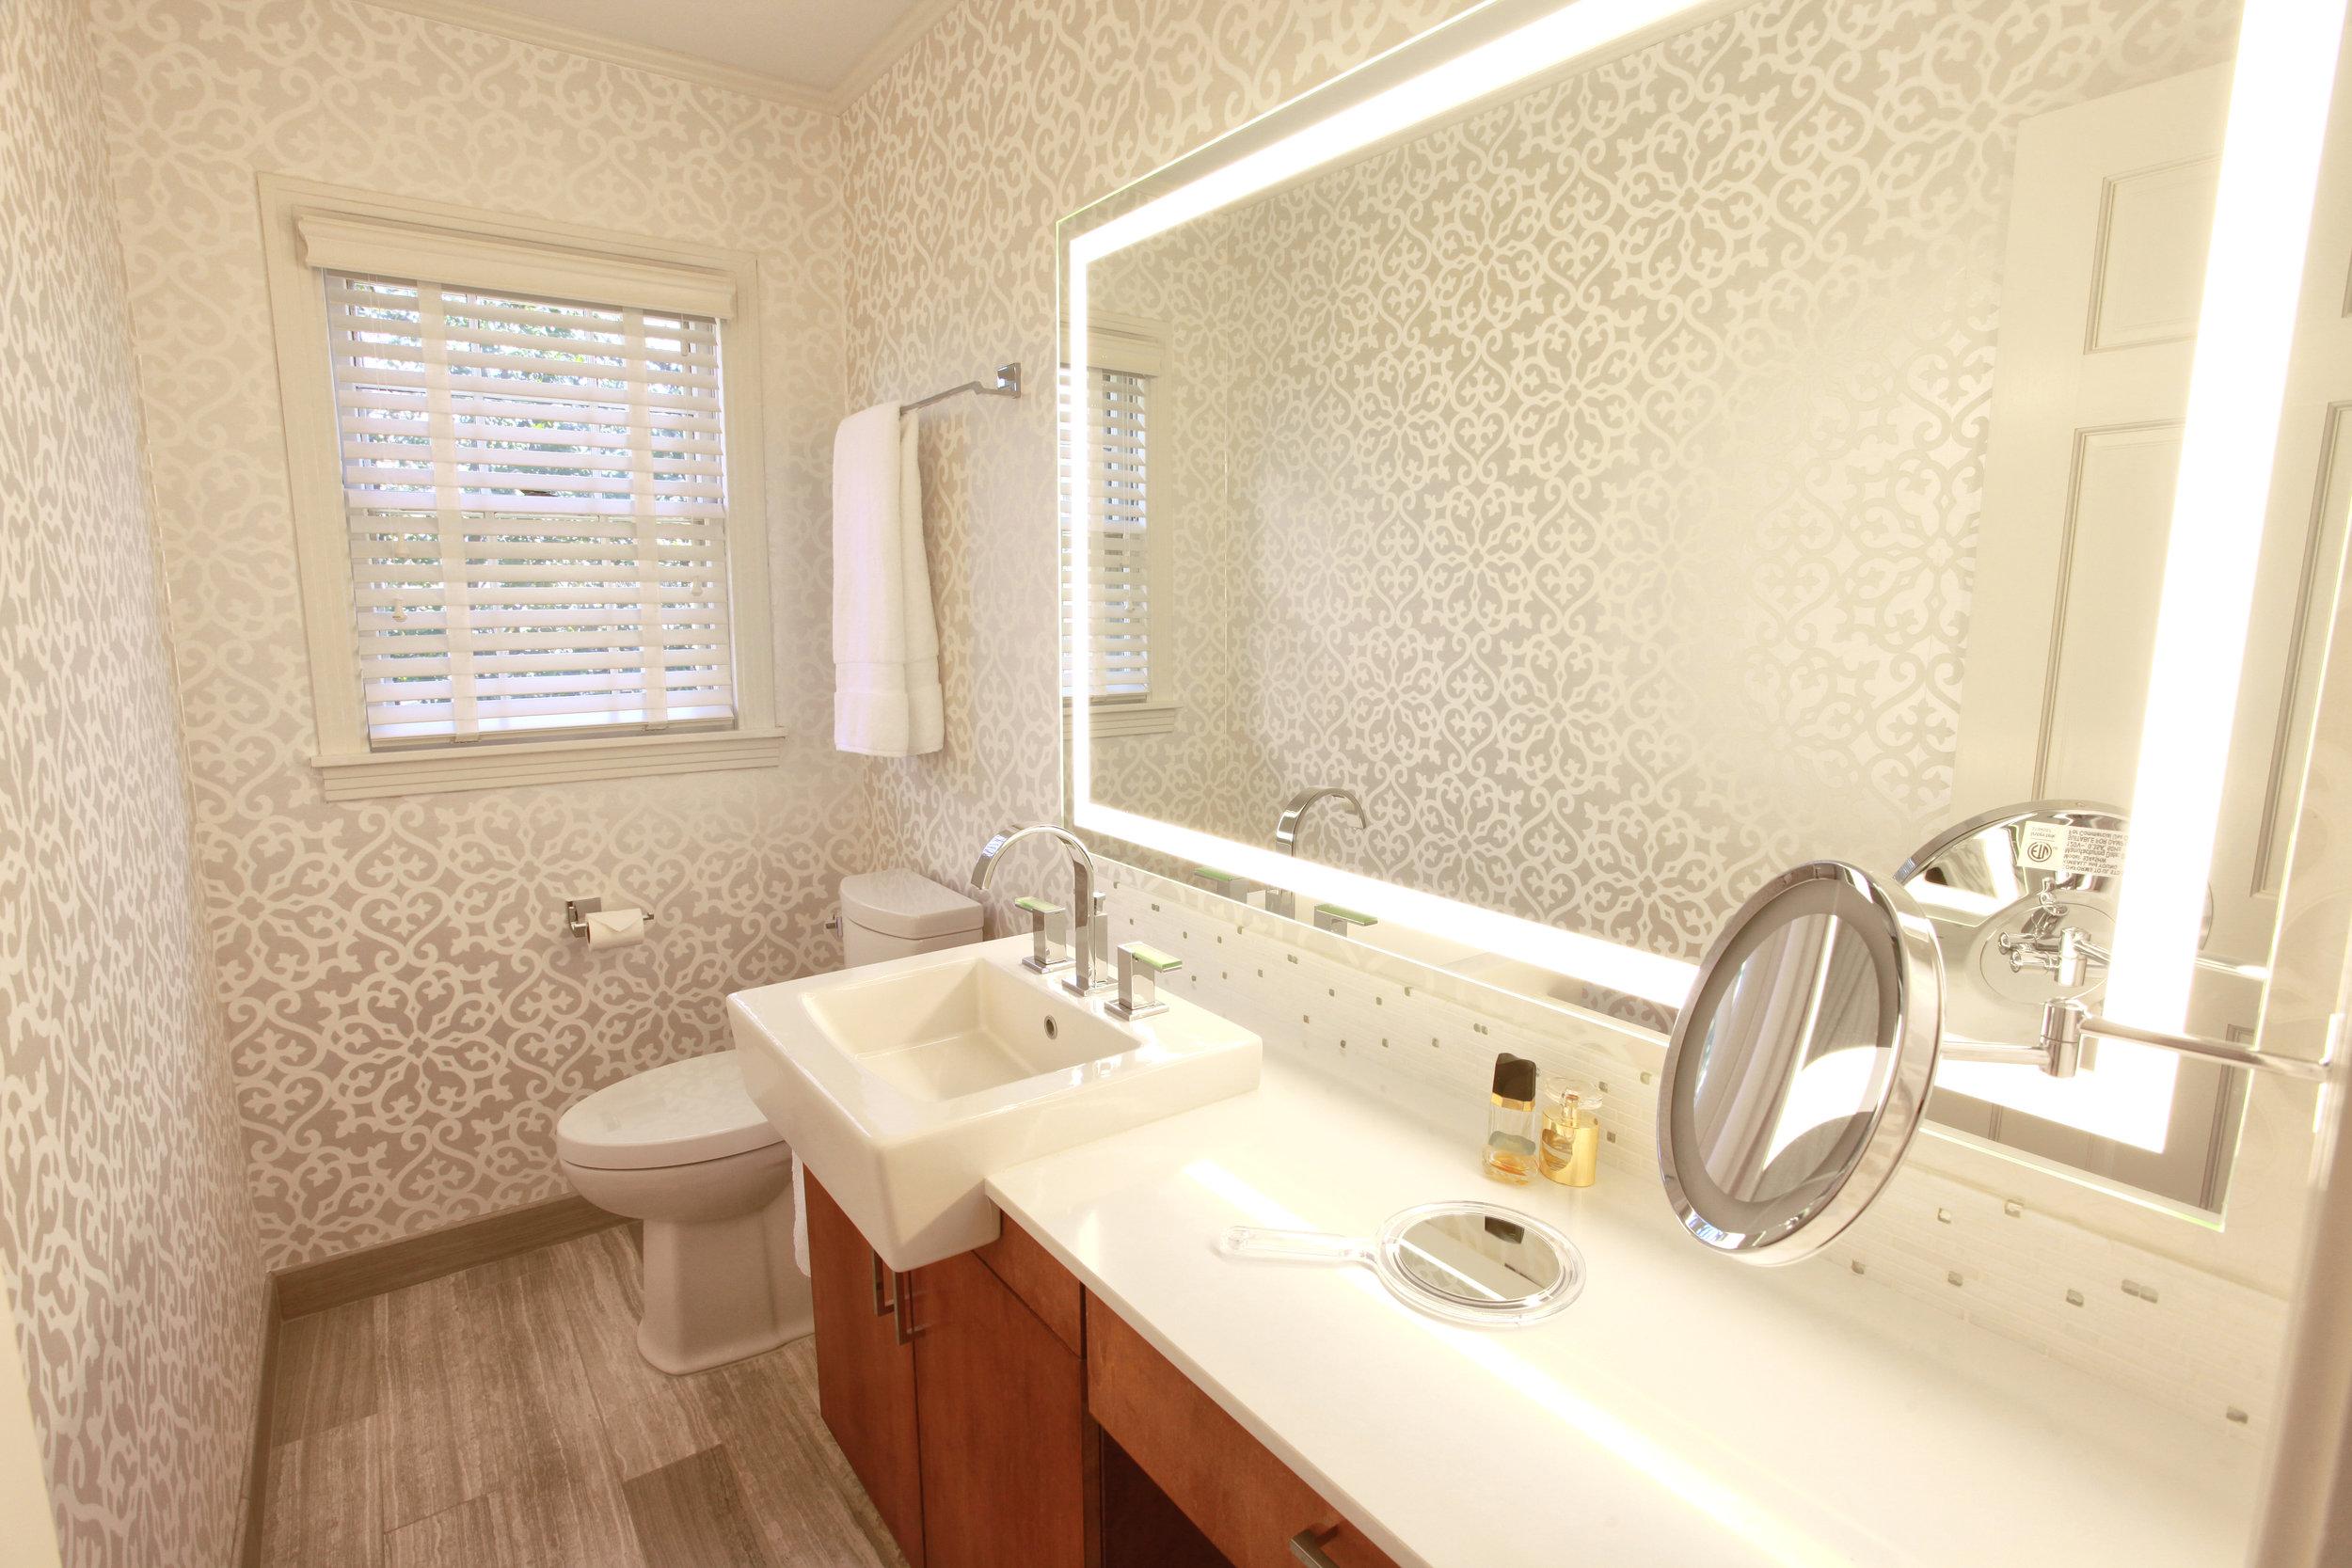 1940's bathroom renovation